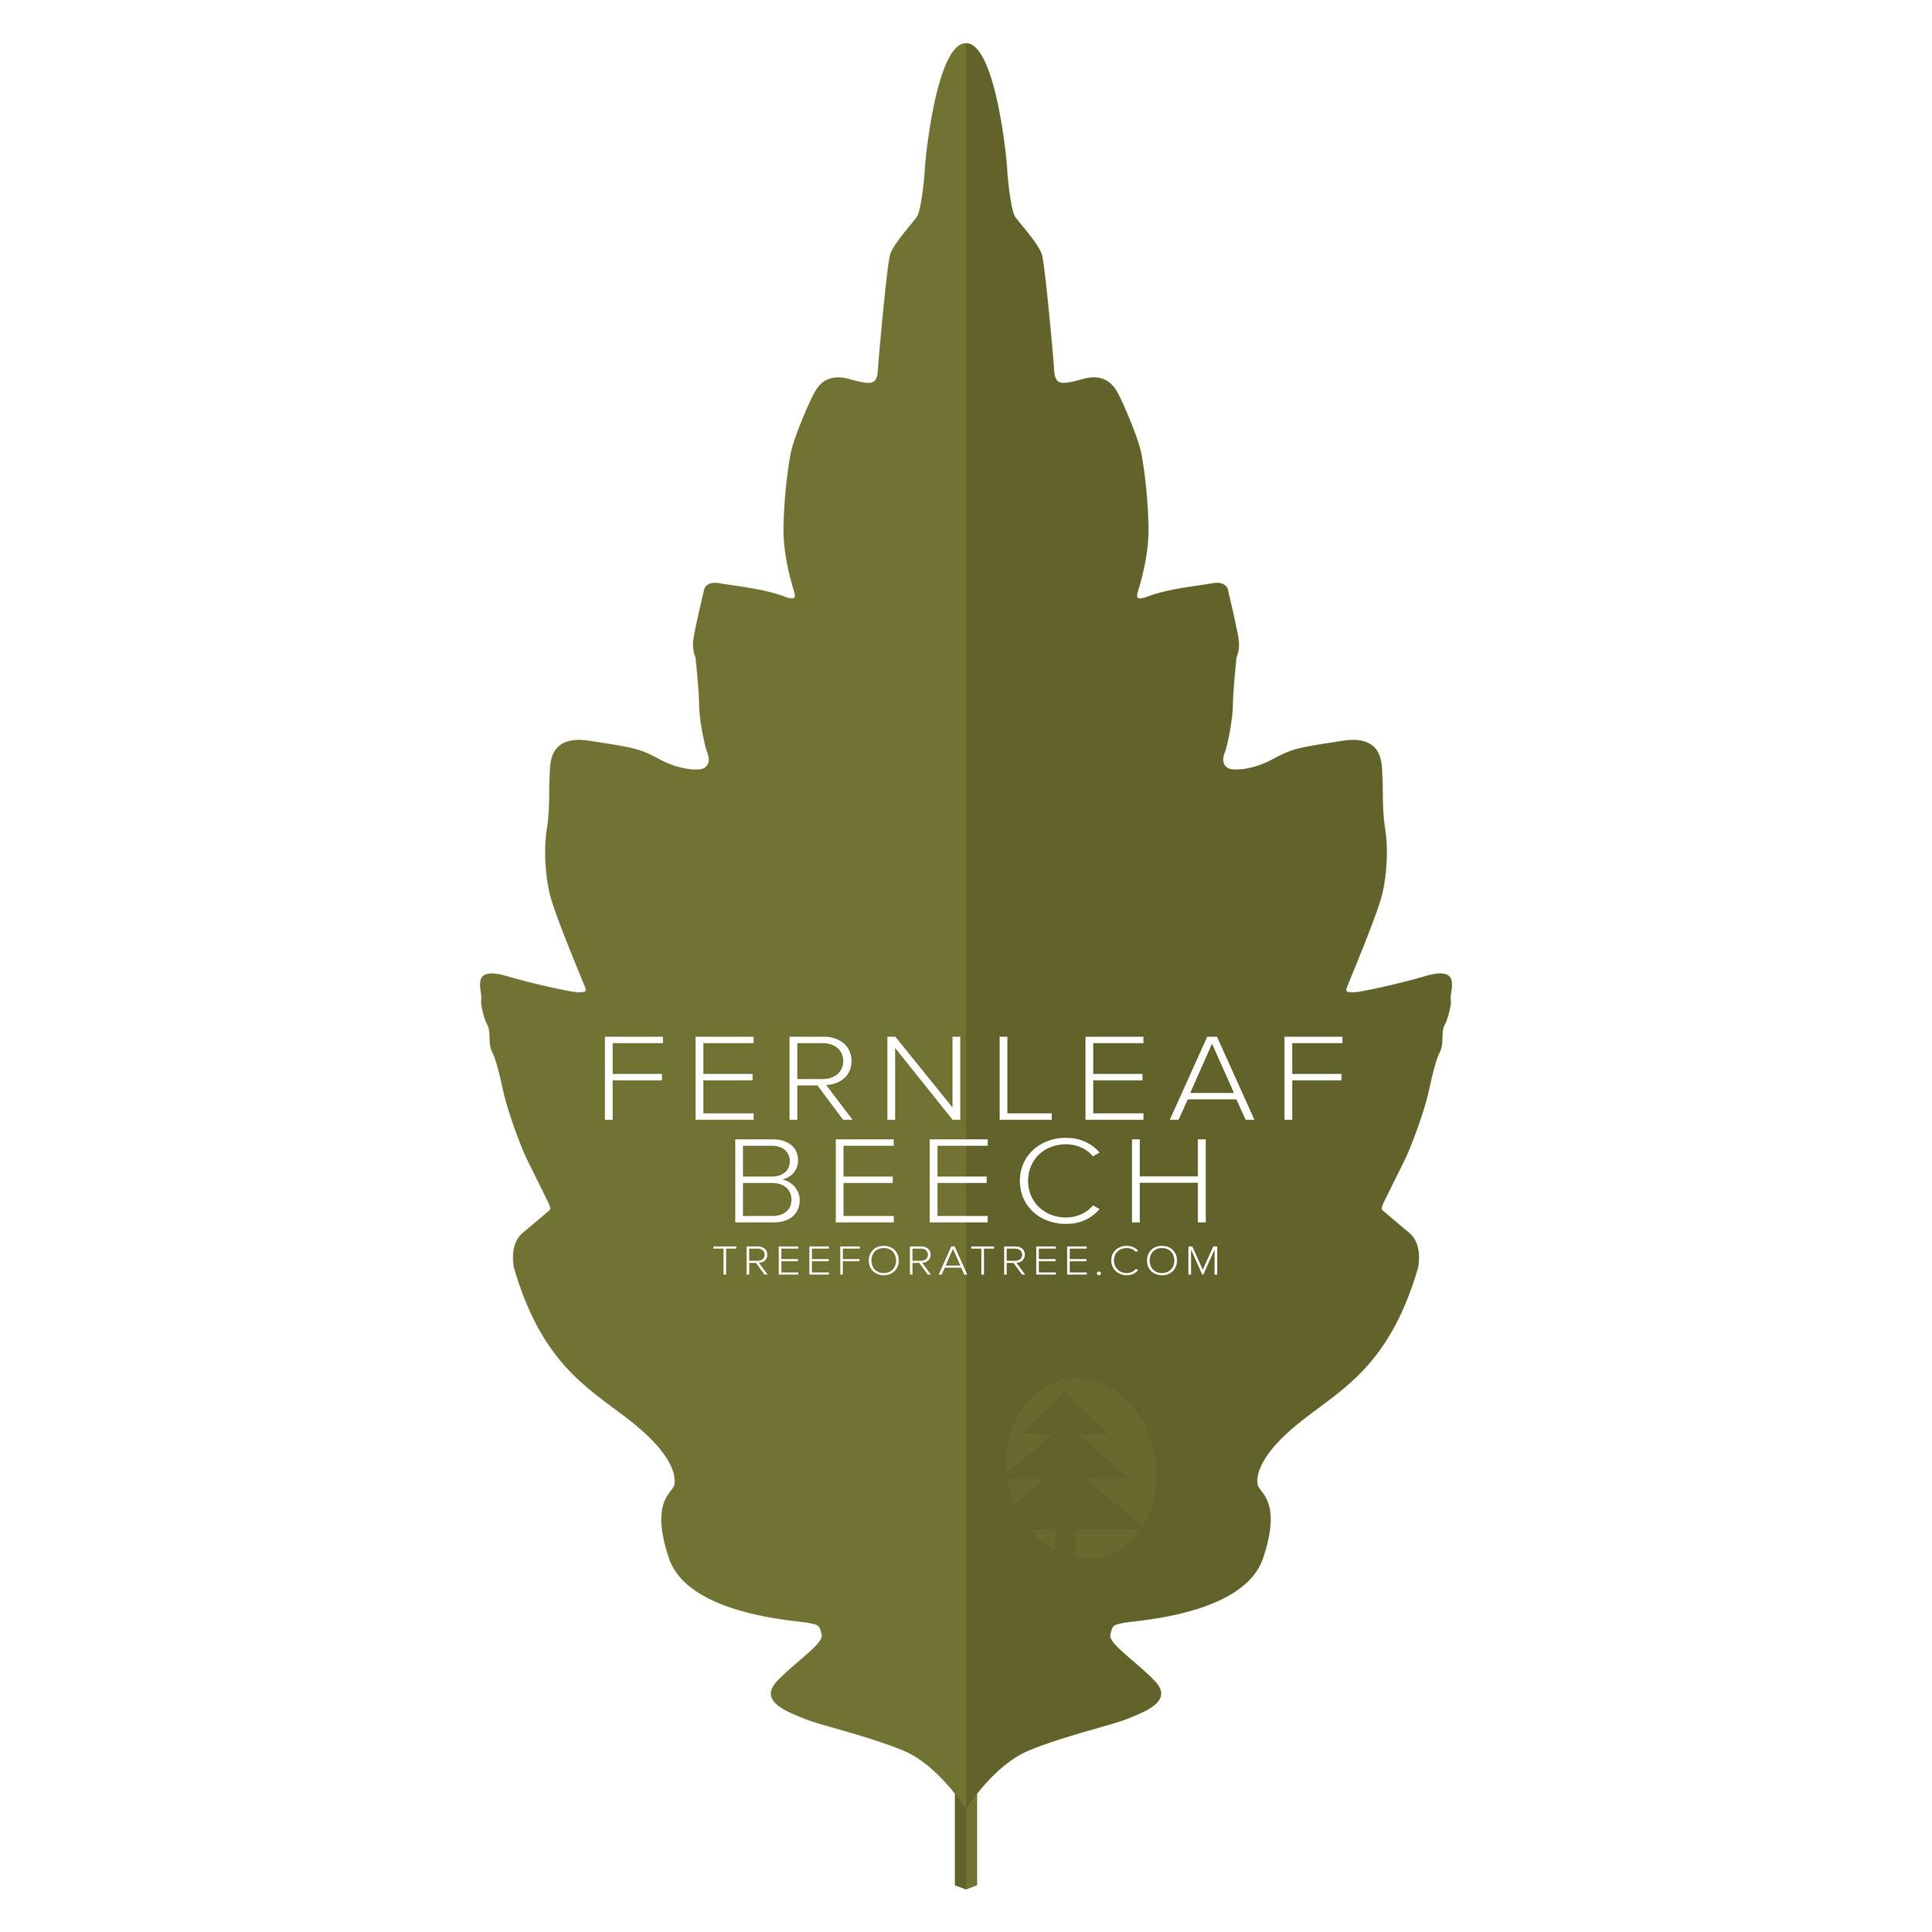 Fernleaf Beech - Latin Name: Fagus sylvatica AsplenifoliaGrowth Rate: SlowMature Height: ≈60 ftMature Spread: ≈40 ftState Champ: N/A